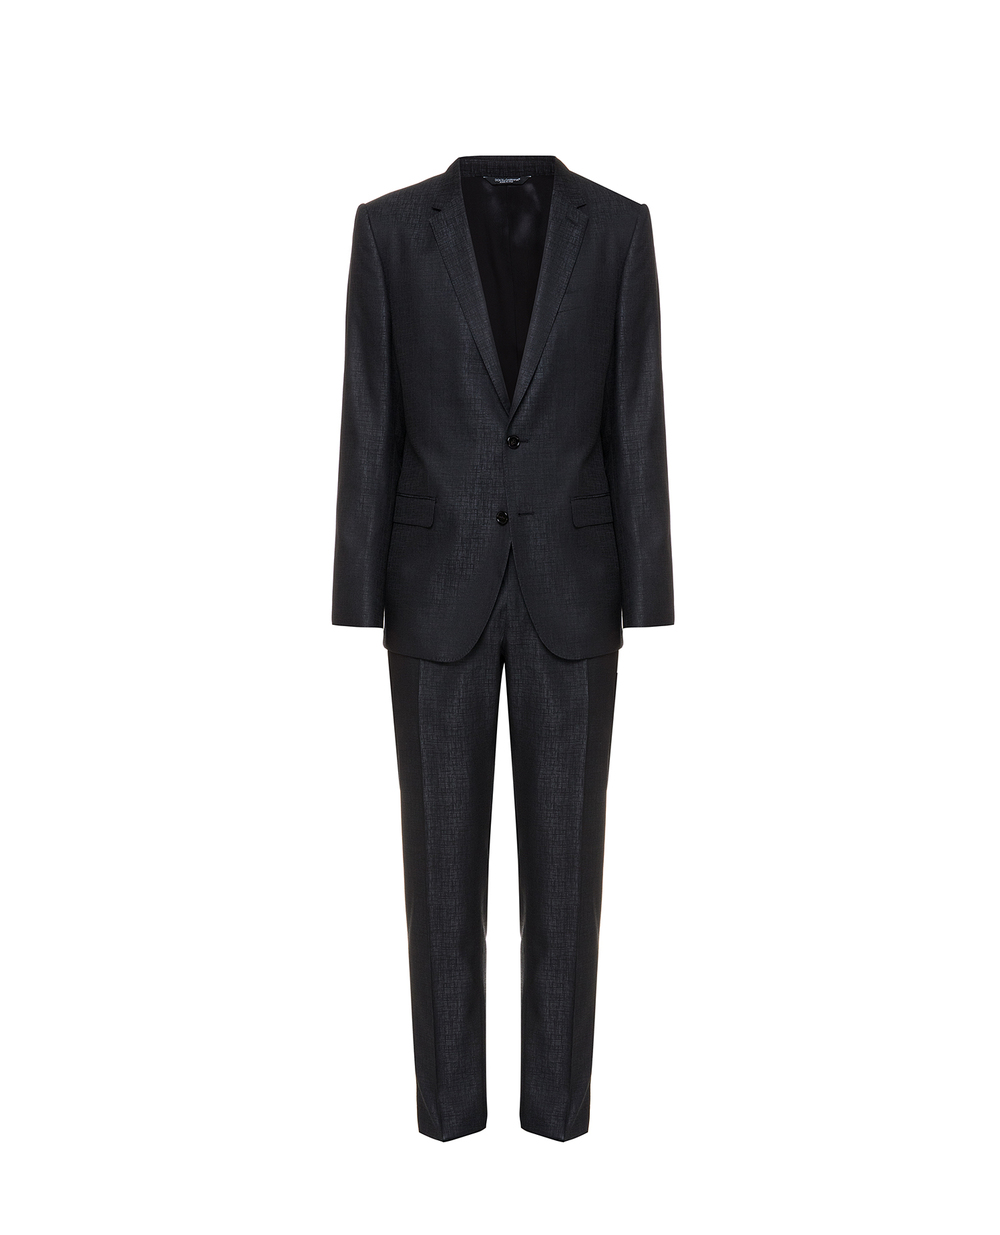 Костюм Martini (пиджак, брюки) Dolce&Gabbana GK0EMT-FJ3DN — Kameron